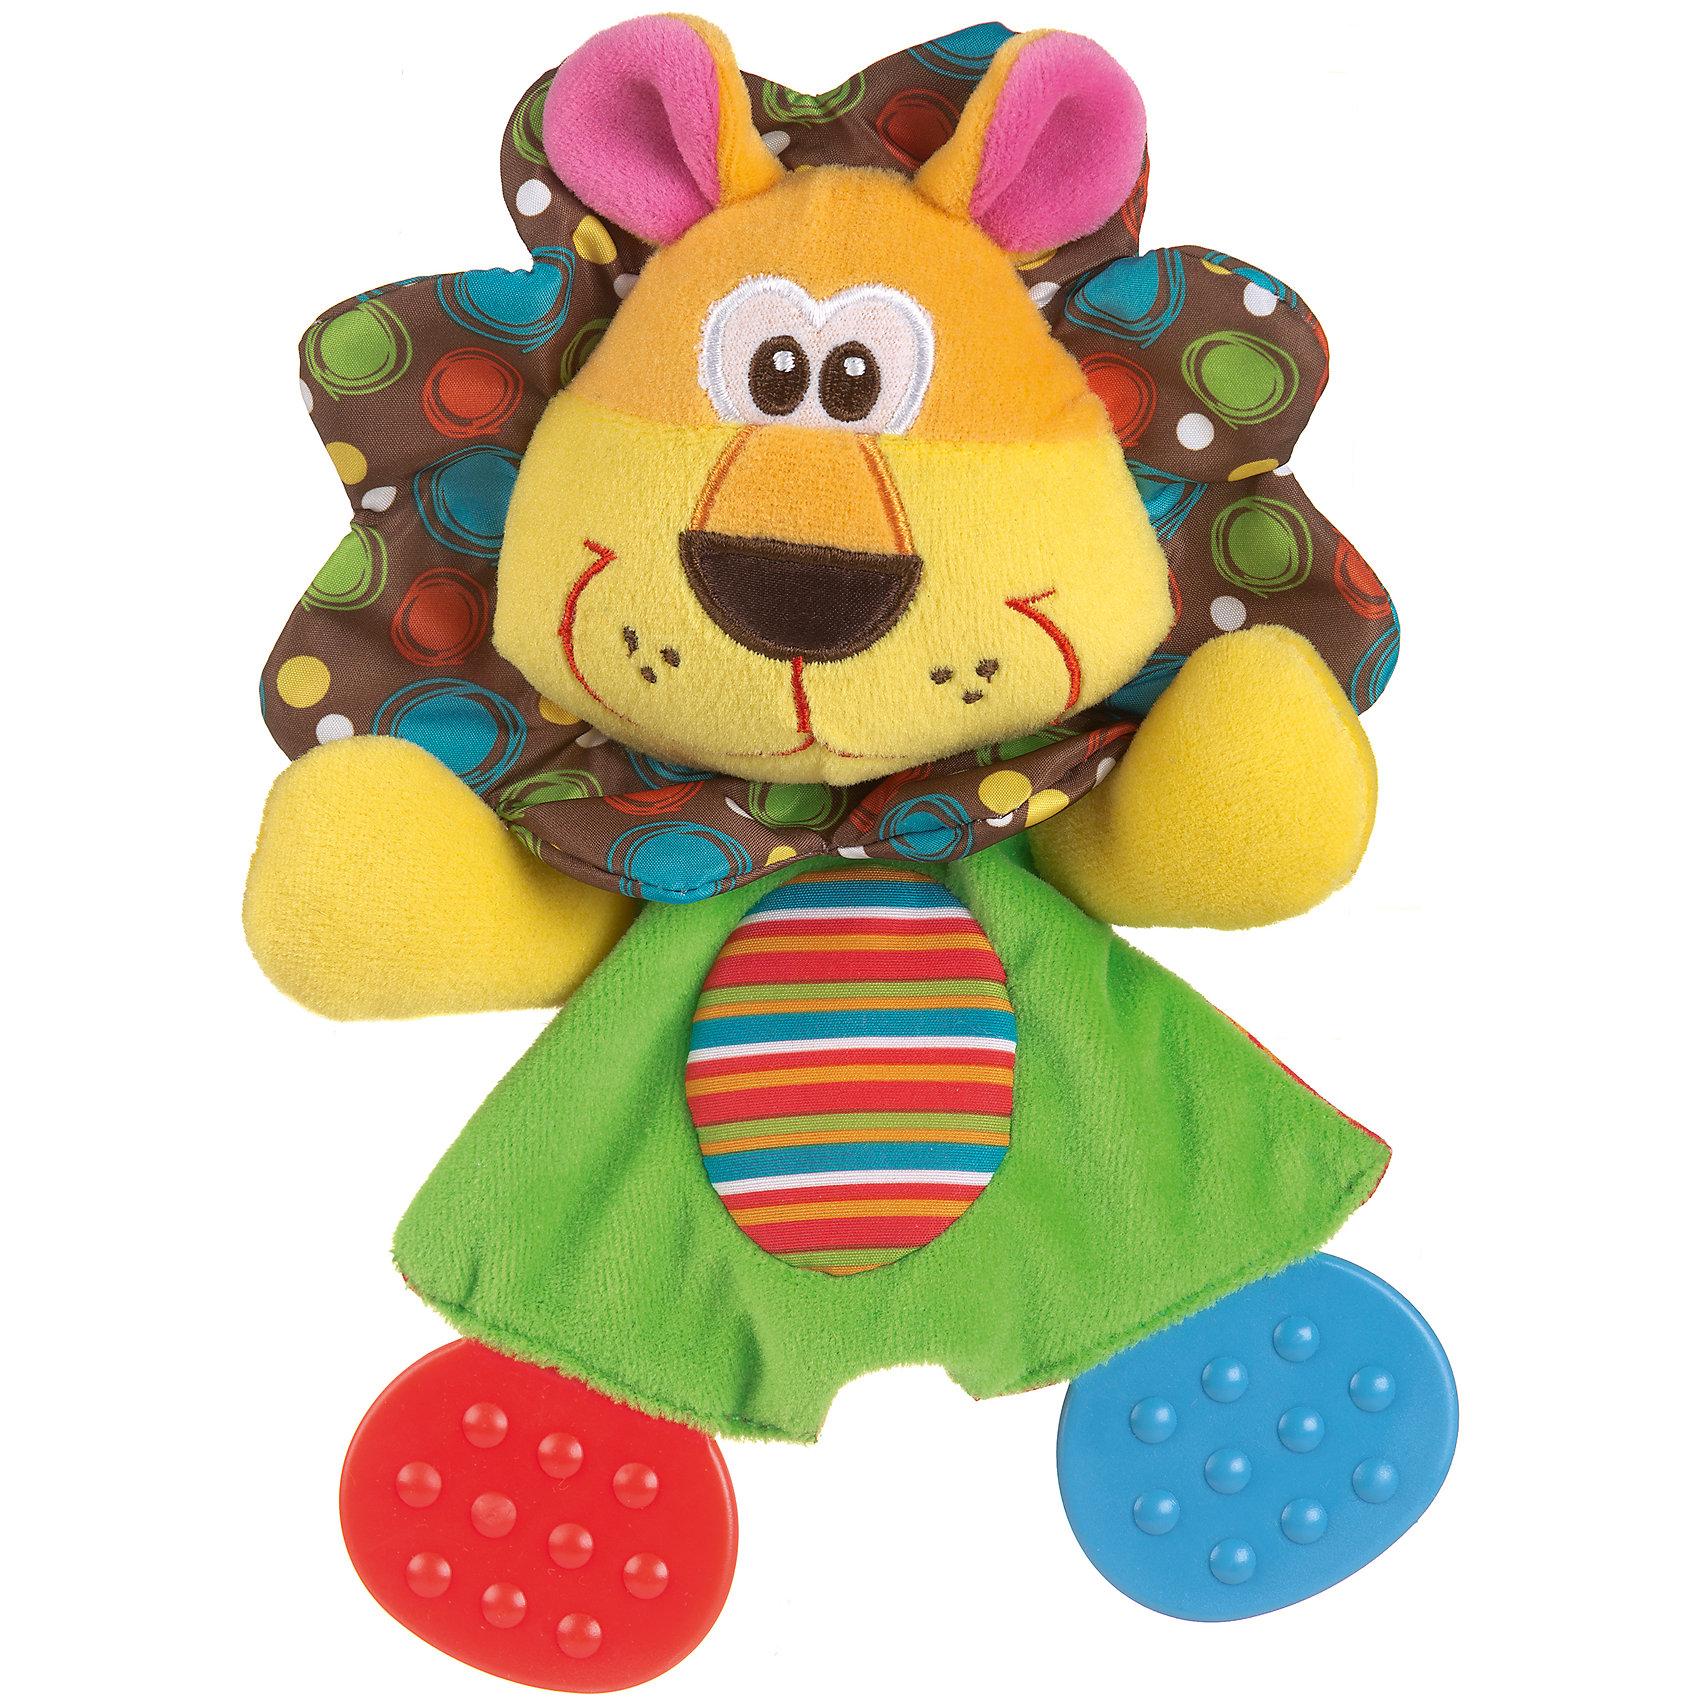 Playgro Мягкая игрушка Львенок, Playgro playgro мягкая игрушка щенок